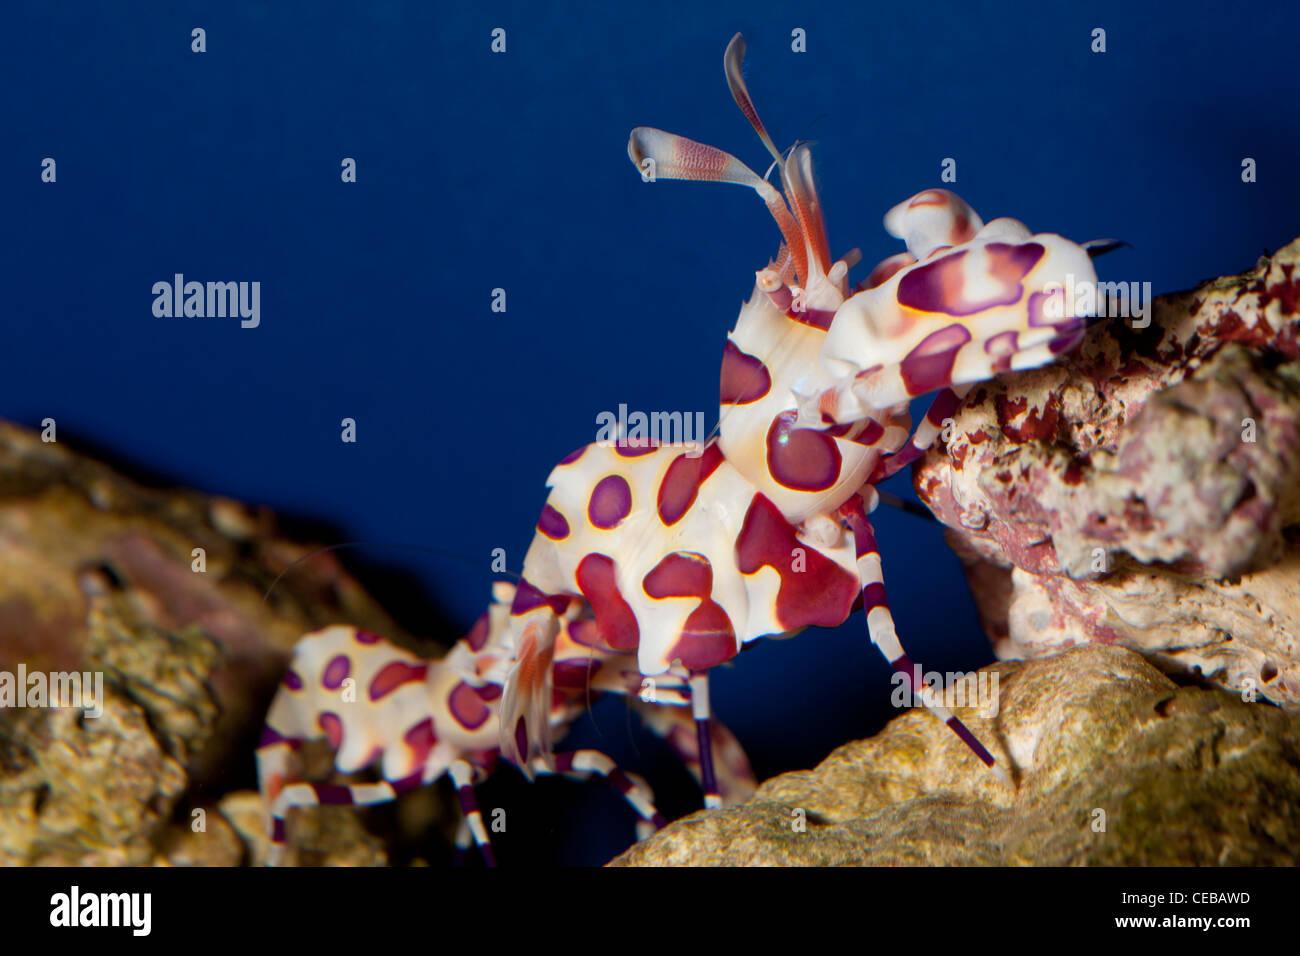 Harlequin shrimp, Hymenocera picta - Stock Image